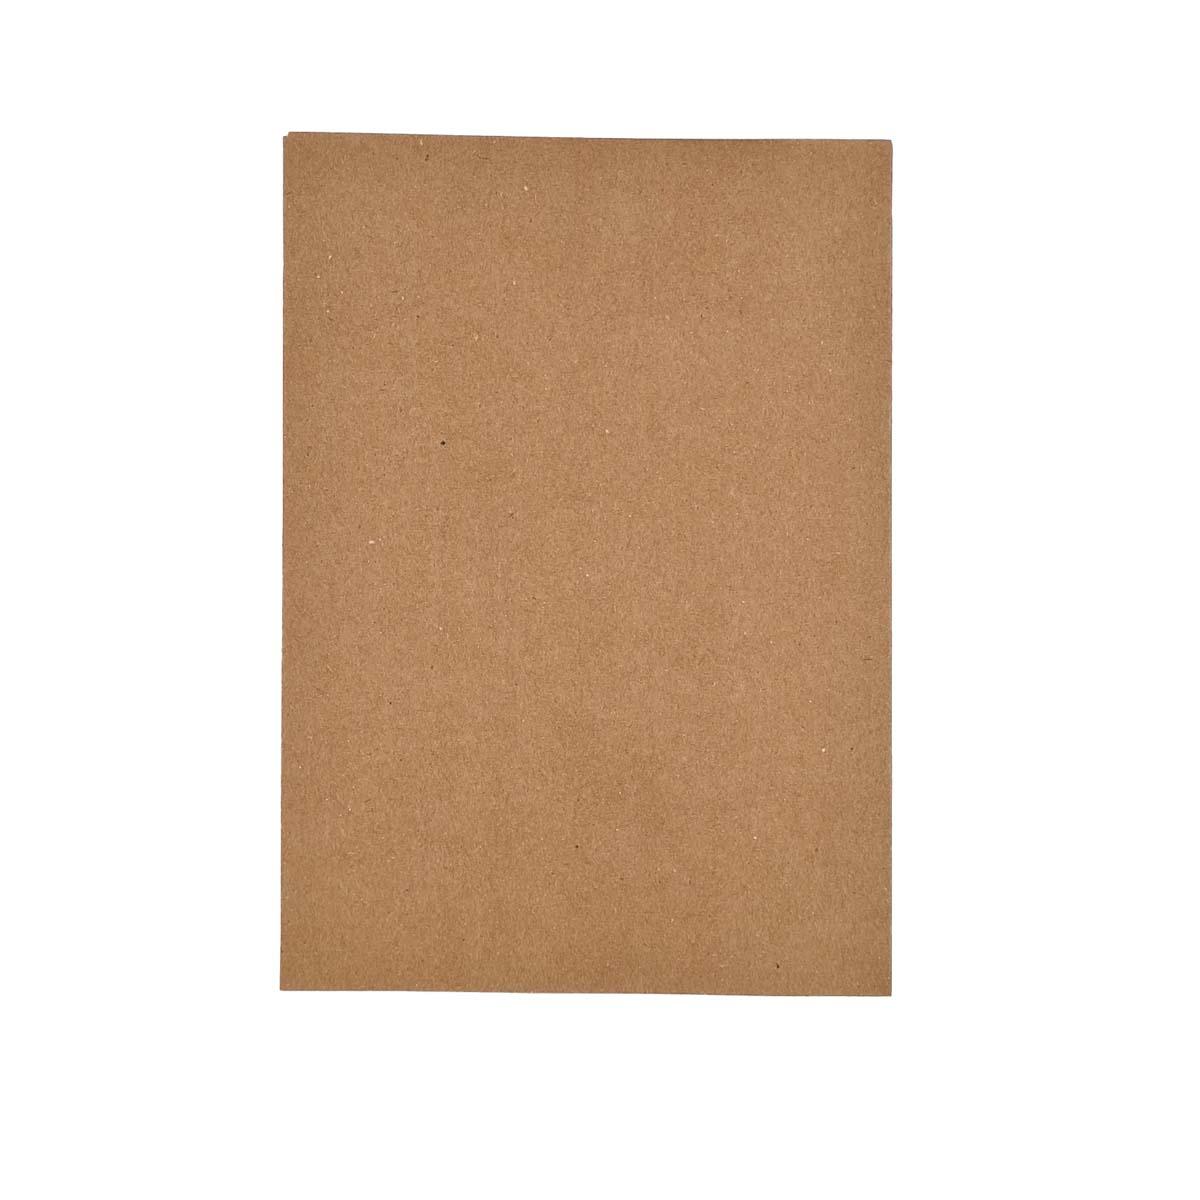 Envelope Saco kraft Natural 80g 162x229 meio A4 Foroni com 100un